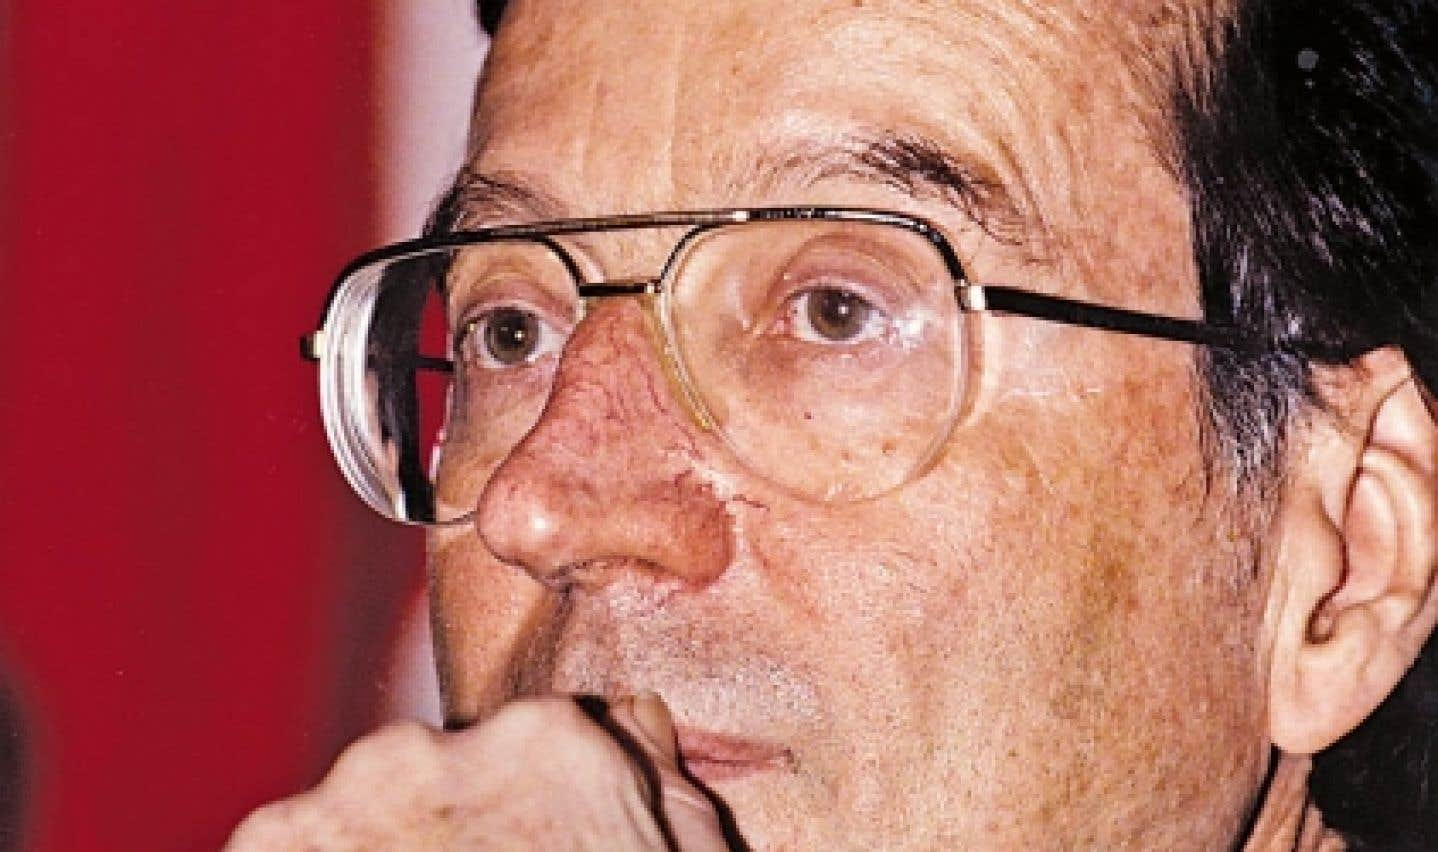 Controverse autour de Robert Bourassa - Combat extrême Lisée-Germain